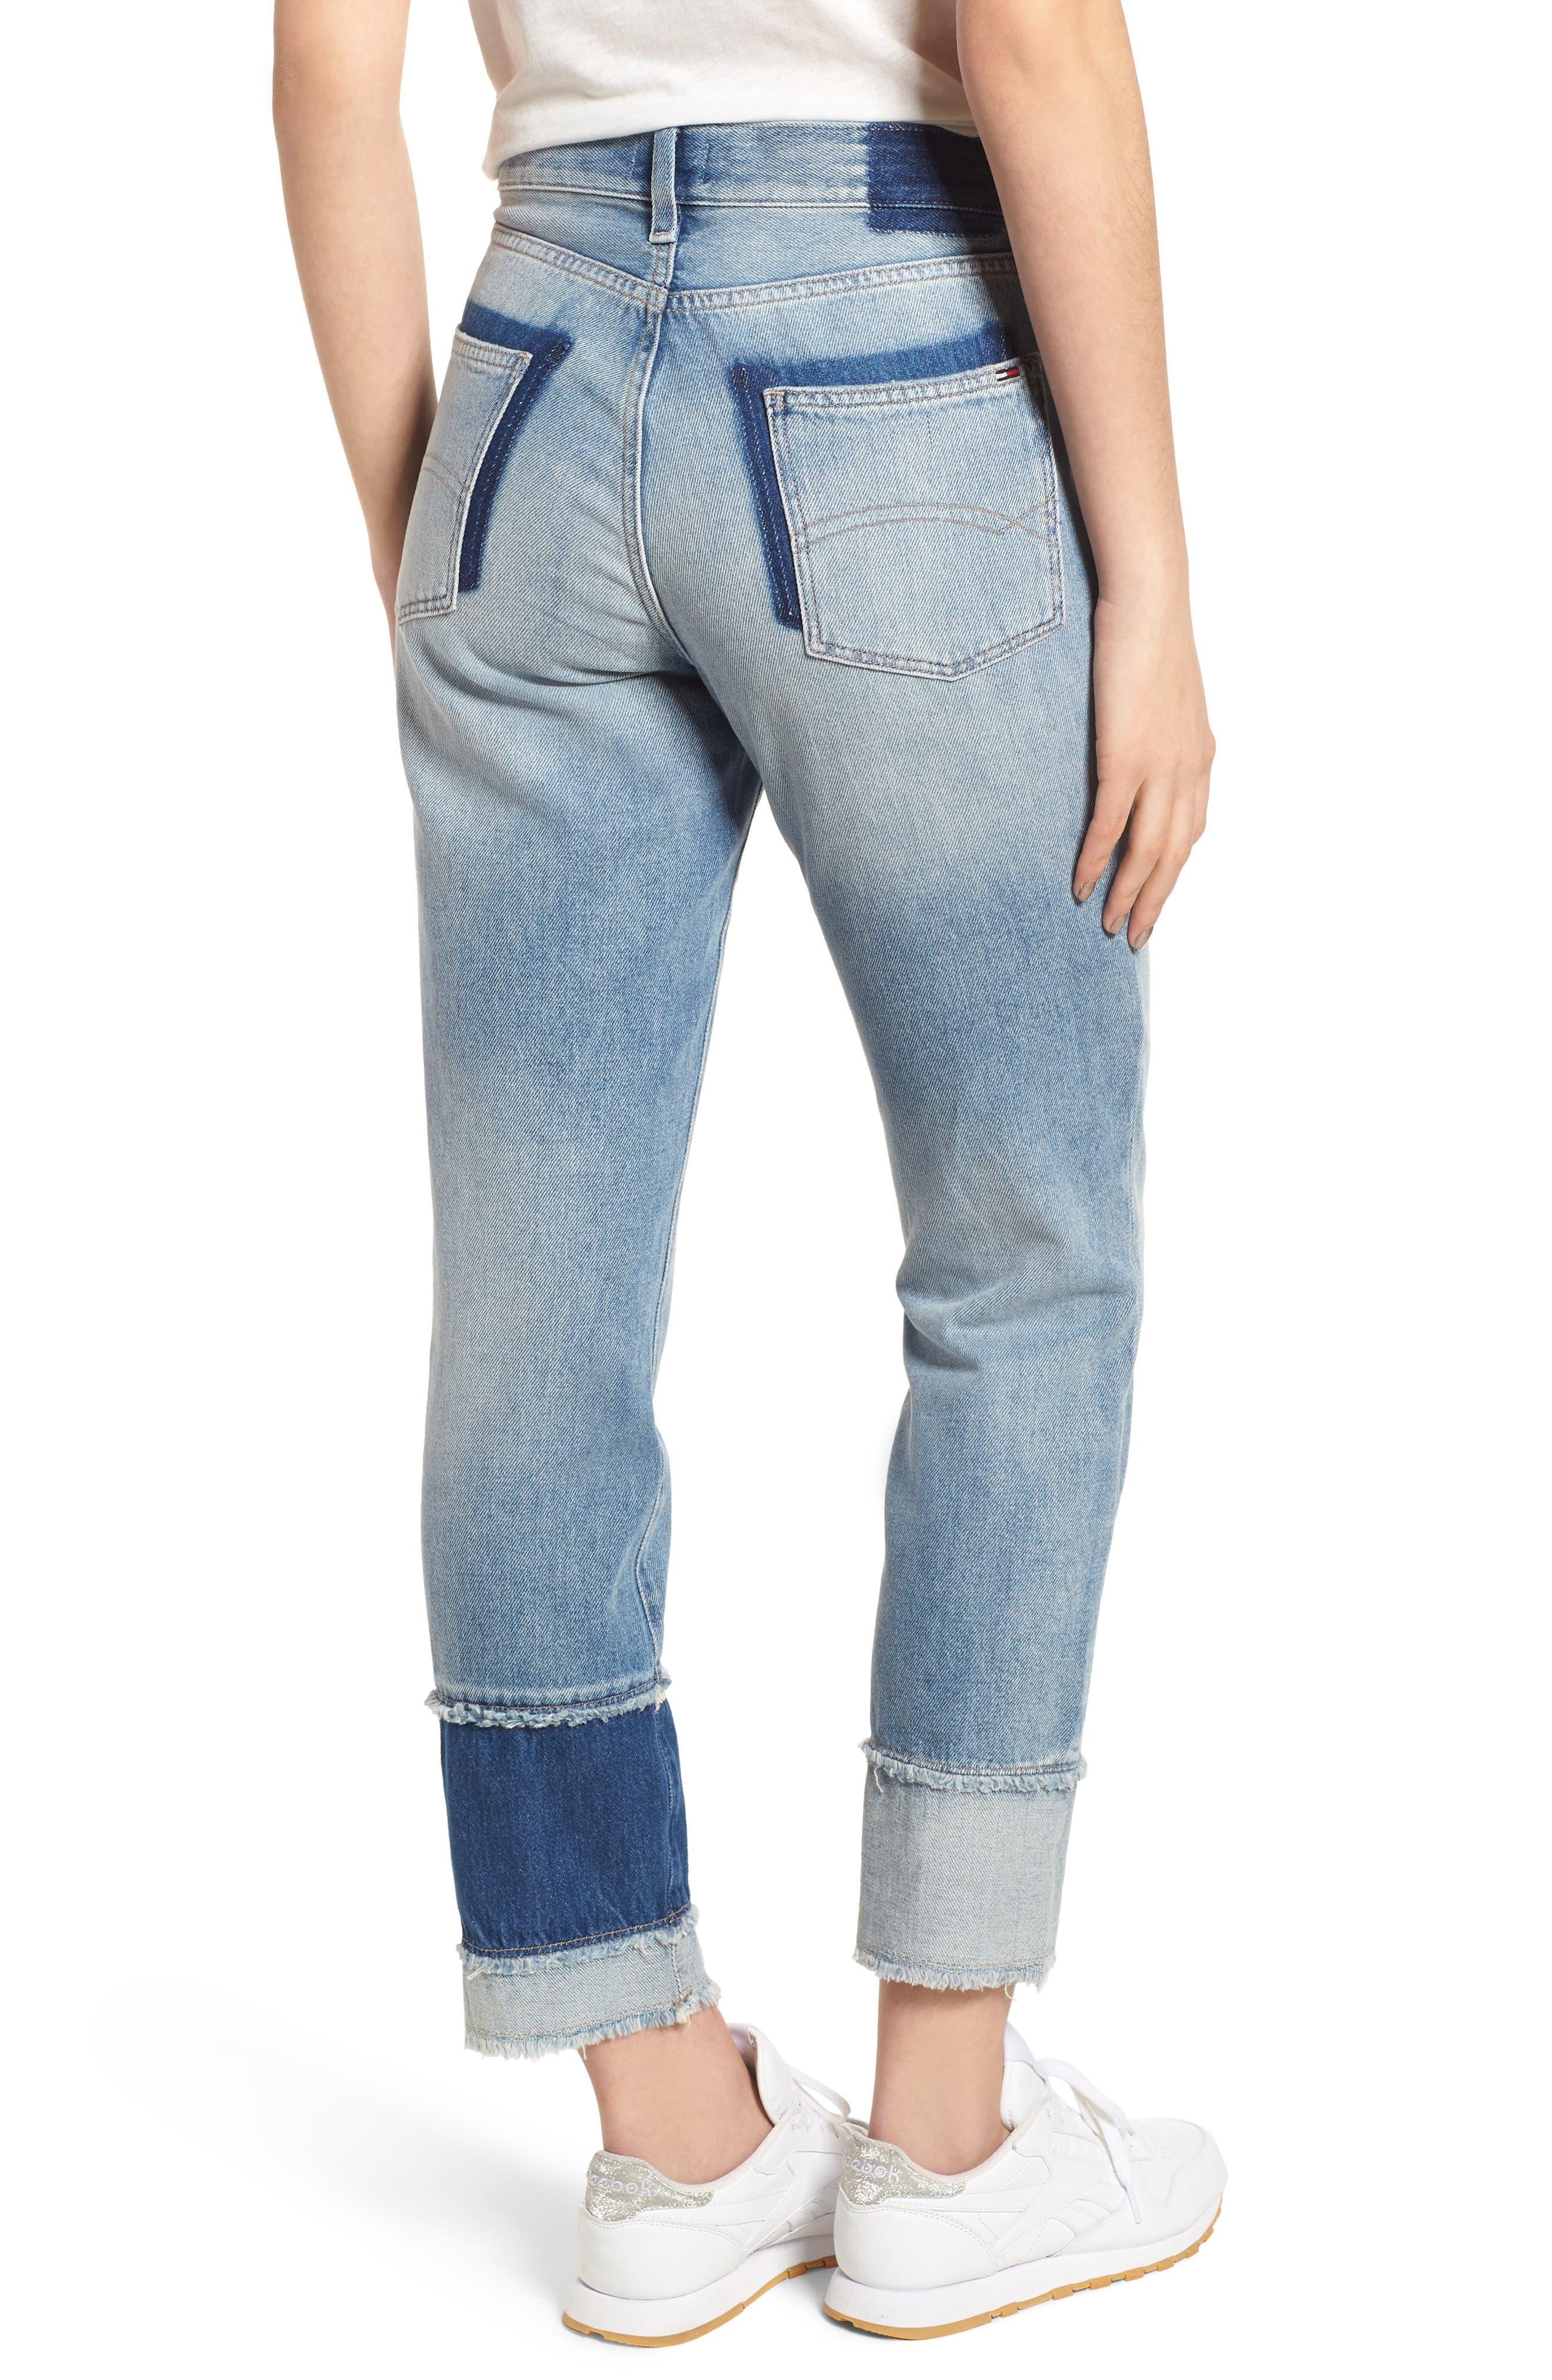 Izzy Layered Cuff Slim Leg Jeans,                             Alternate thumbnail 2, color,                             Raw Patch Light Blue Rigid